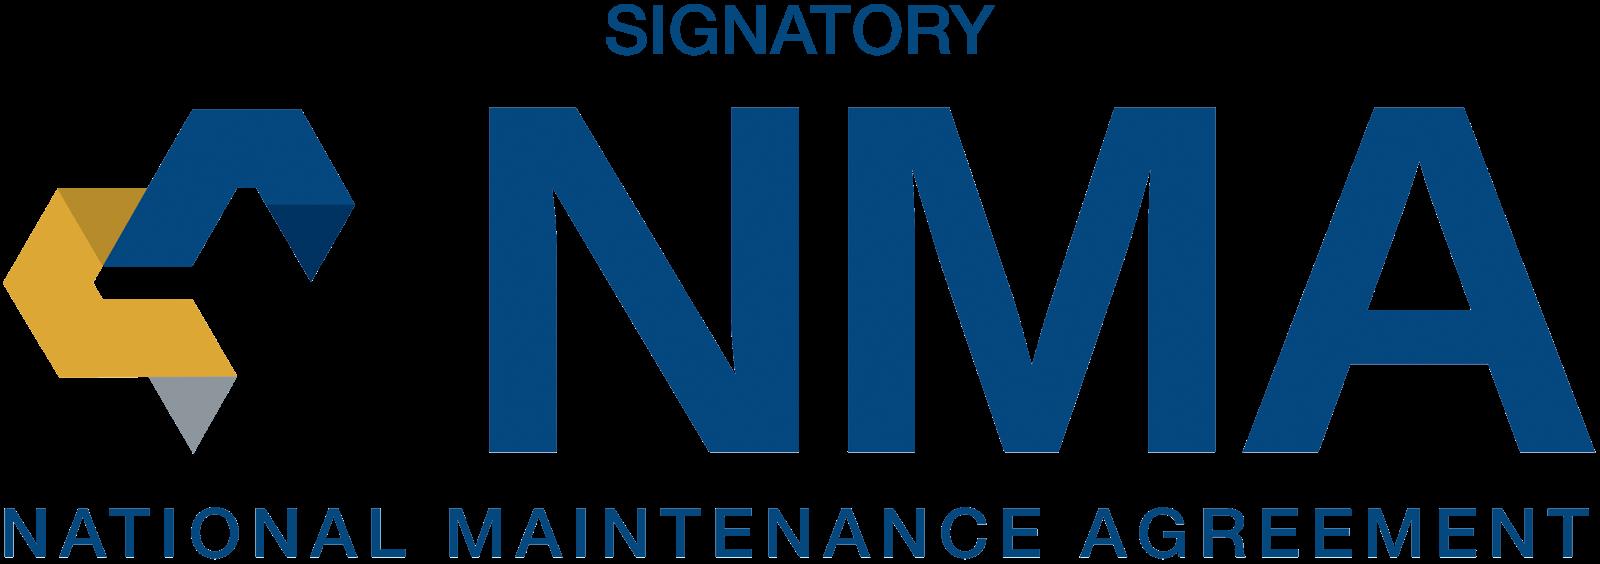 Nma Signatory Logo Motor City Electric Co